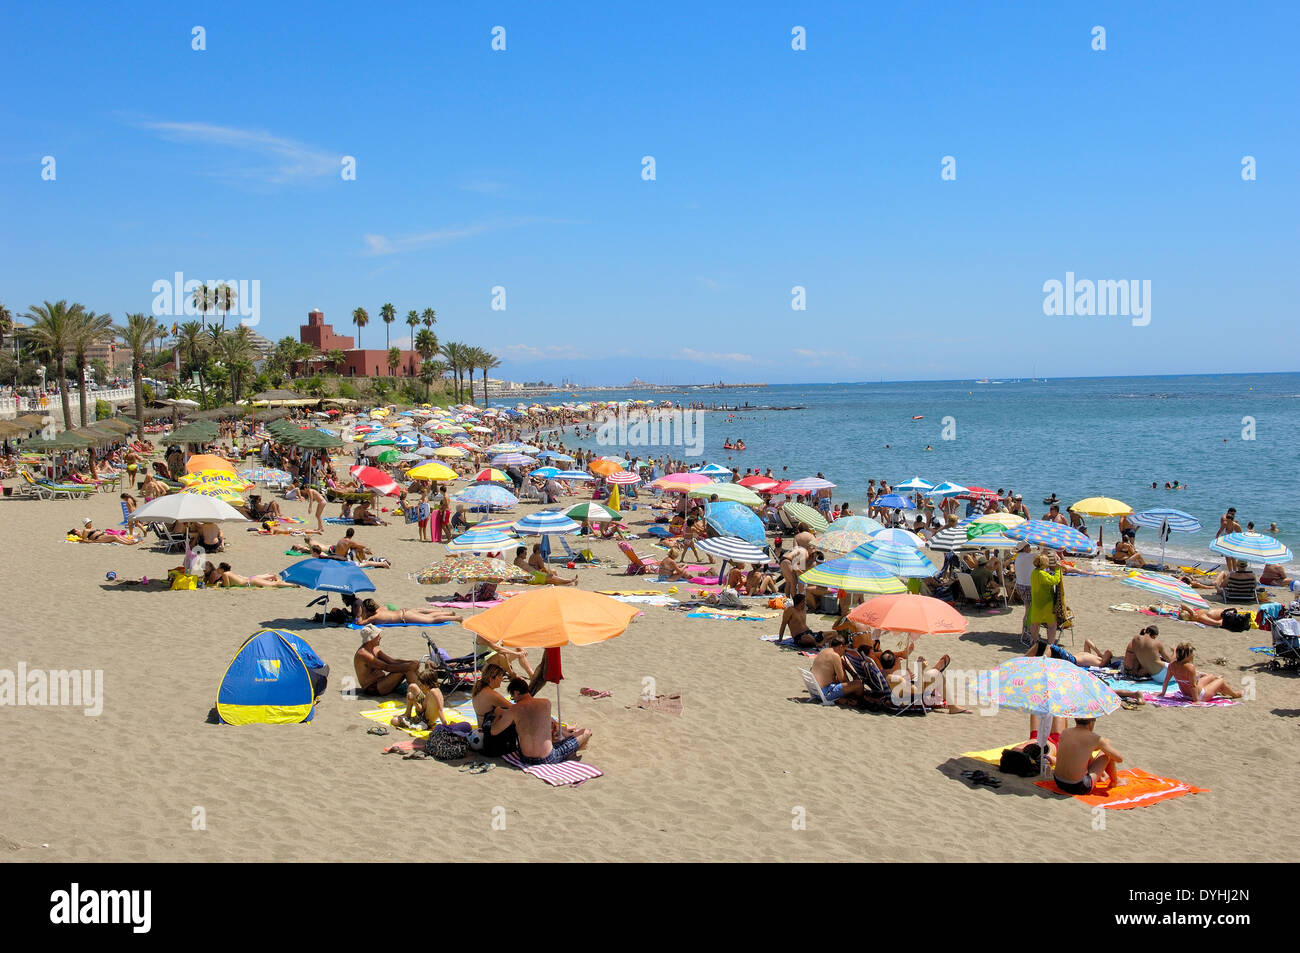 Beach and Bil-Bil castle at background, Benalmadena. Malaga province, Costa del Sol, Andalucia, Spain - Stock Image